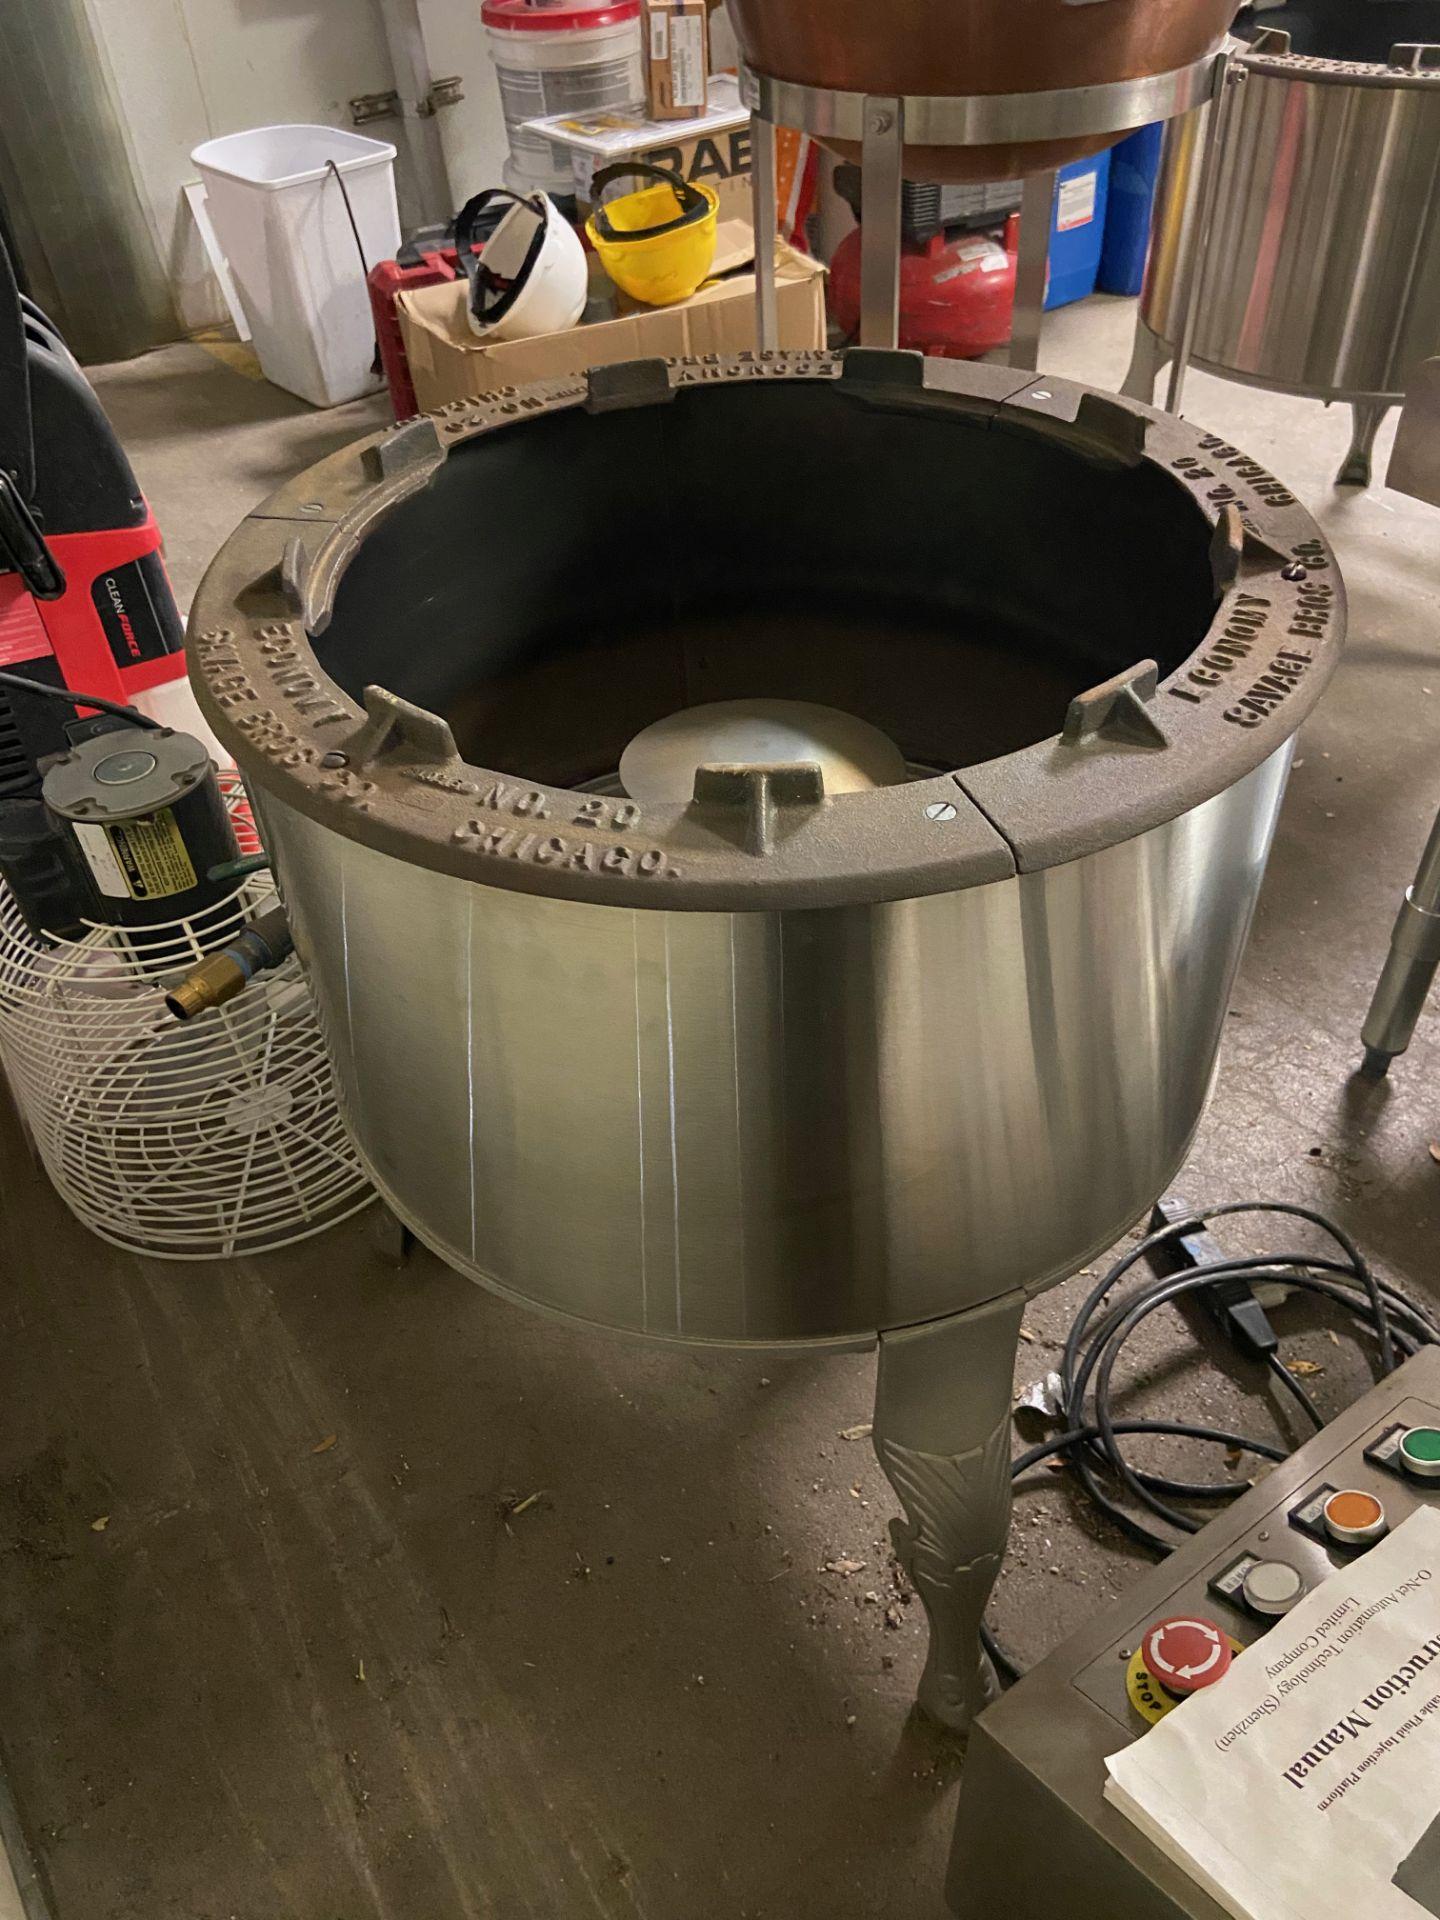 NEW Savage Bros Gas Candy Stove, Model# 20B, Serial# 024376, 80,000 BTU/HR - Image 5 of 6